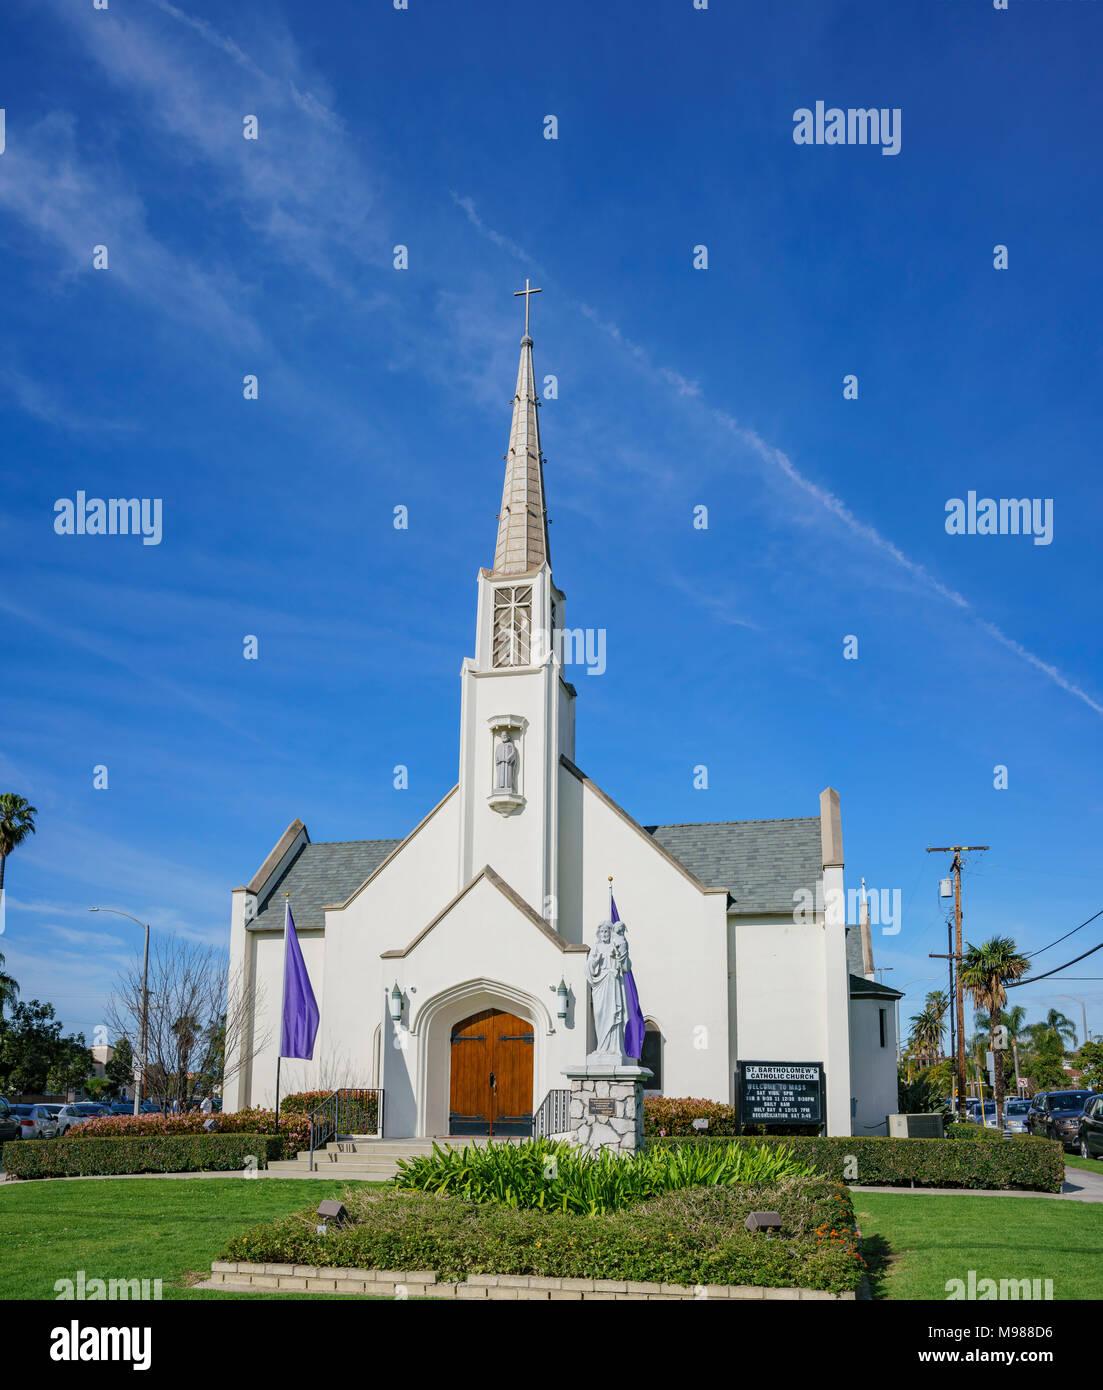 Exterior view of the Saint Bartholomew Catholic Church at Long Beach, Los Angeles County - Stock Image